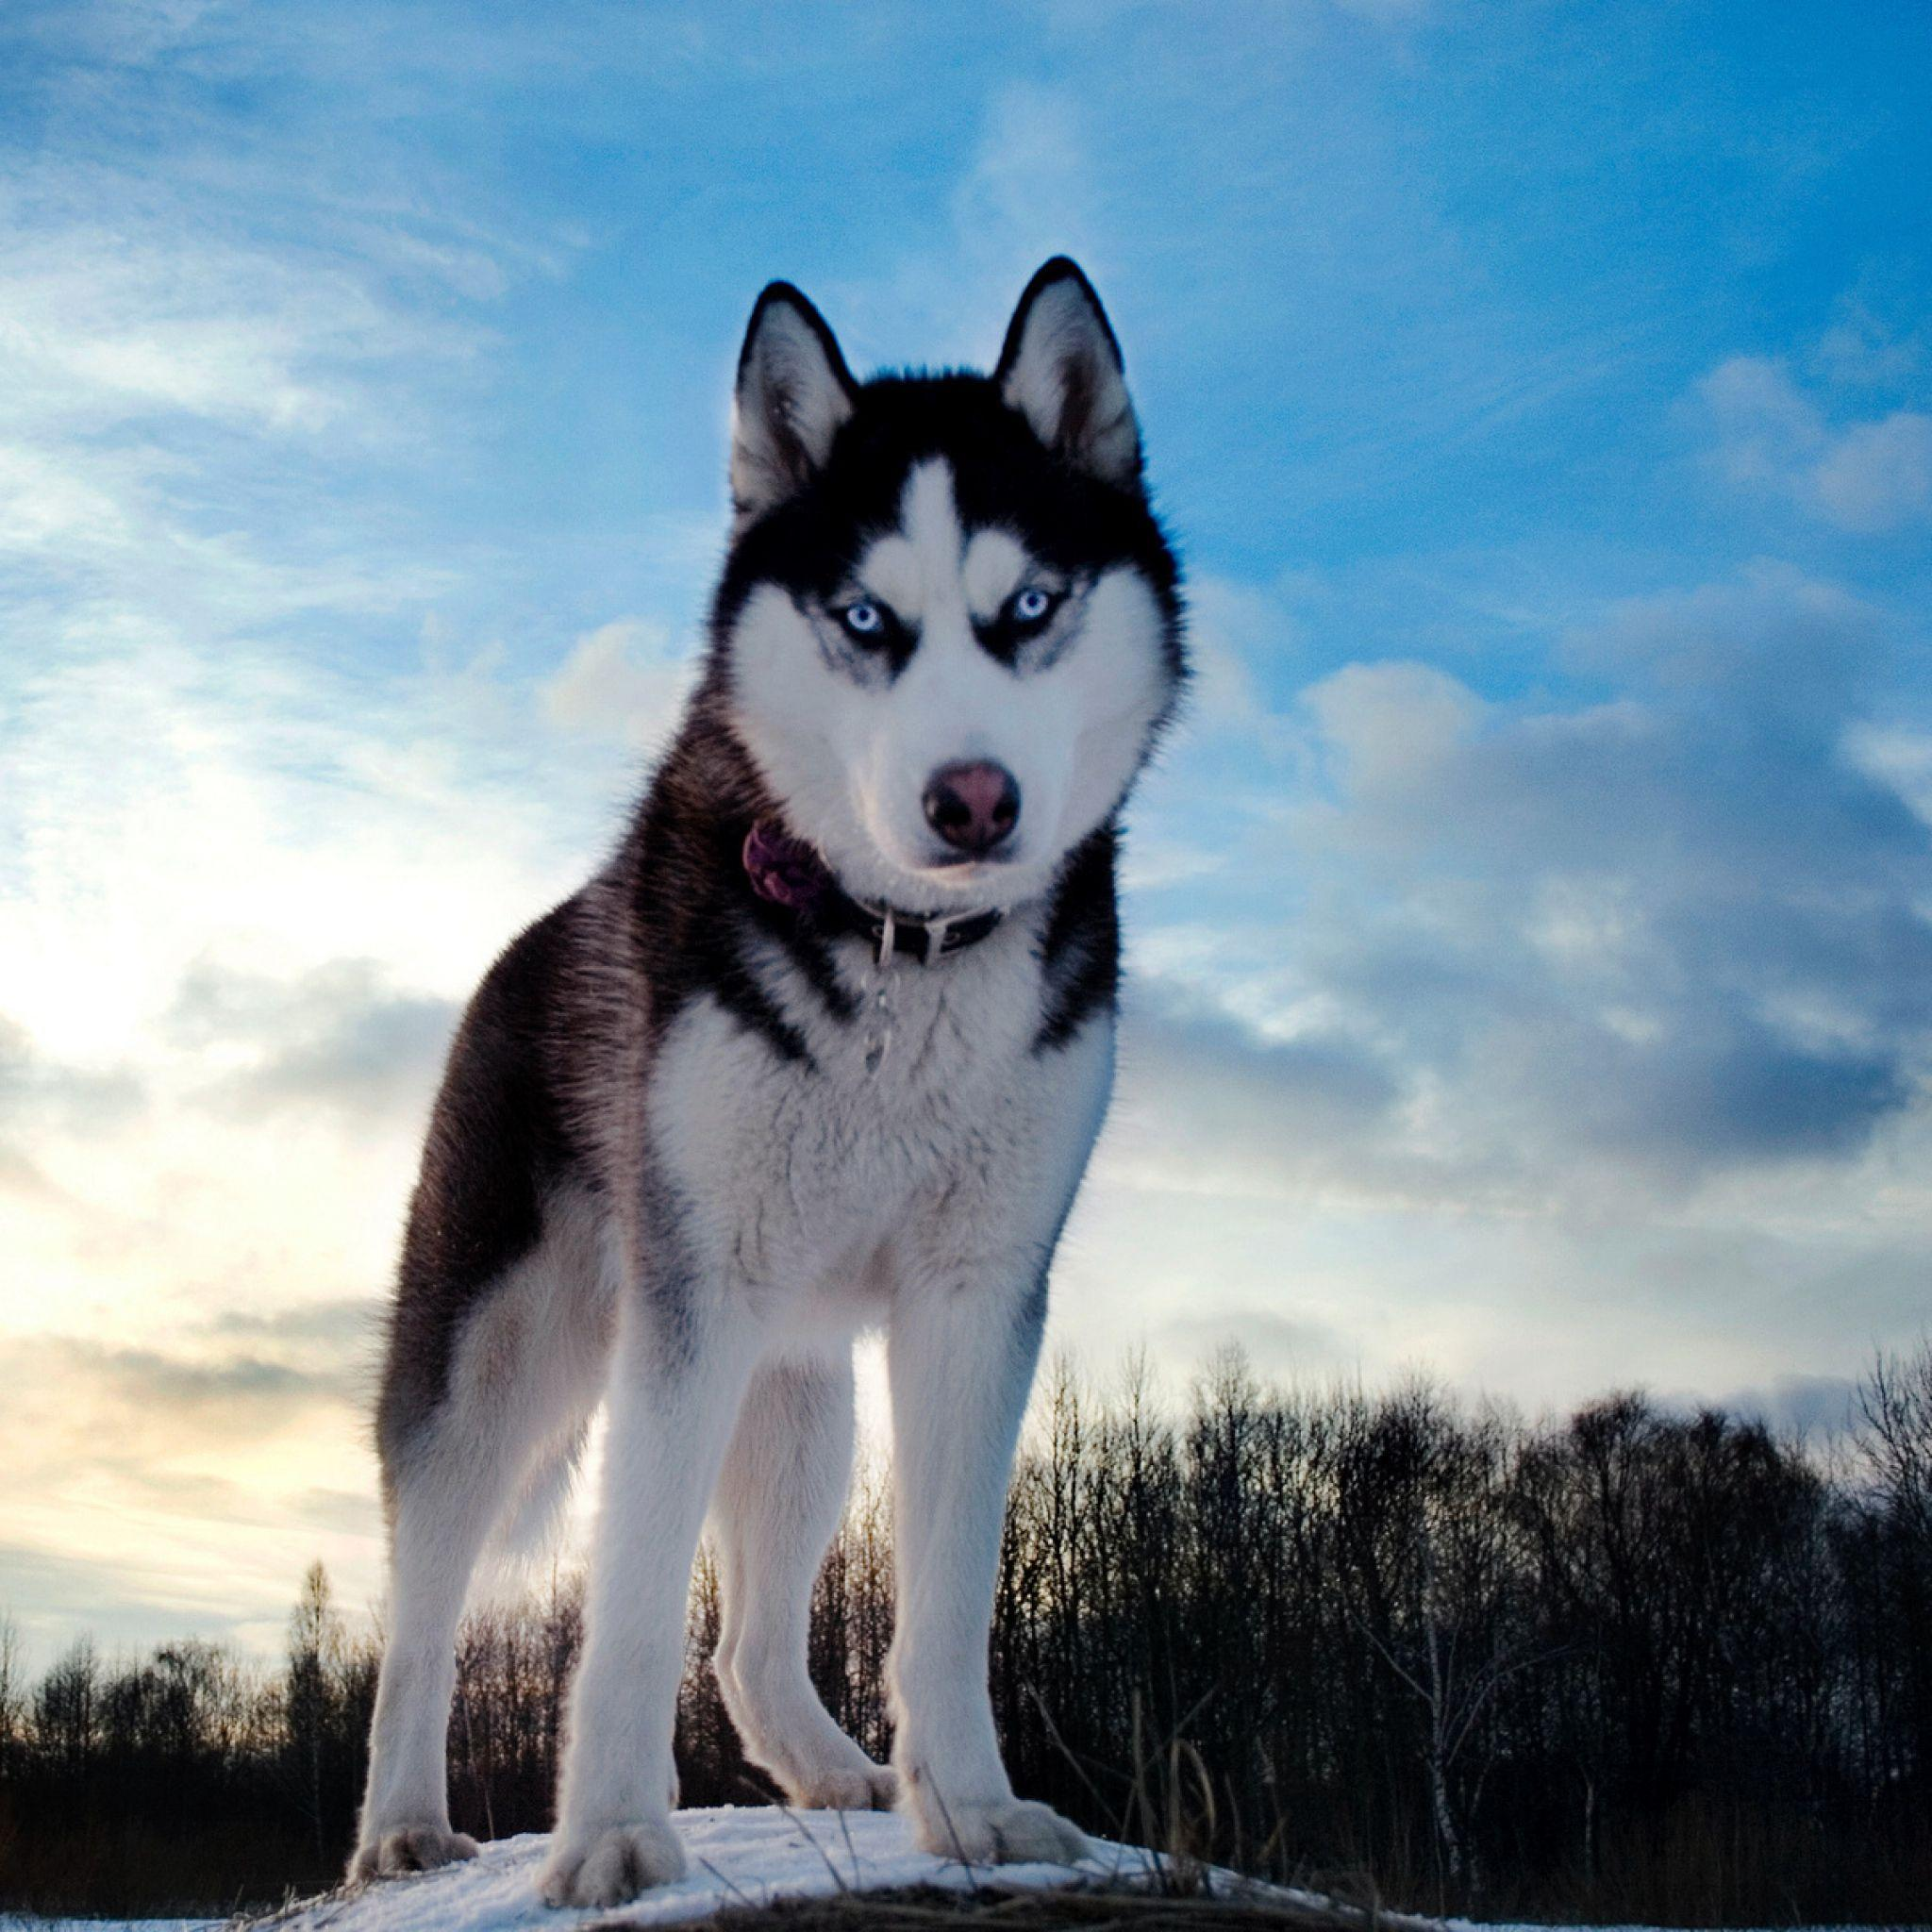 Huskies Dogs In Winter Wallpapers Wallpaper Cave